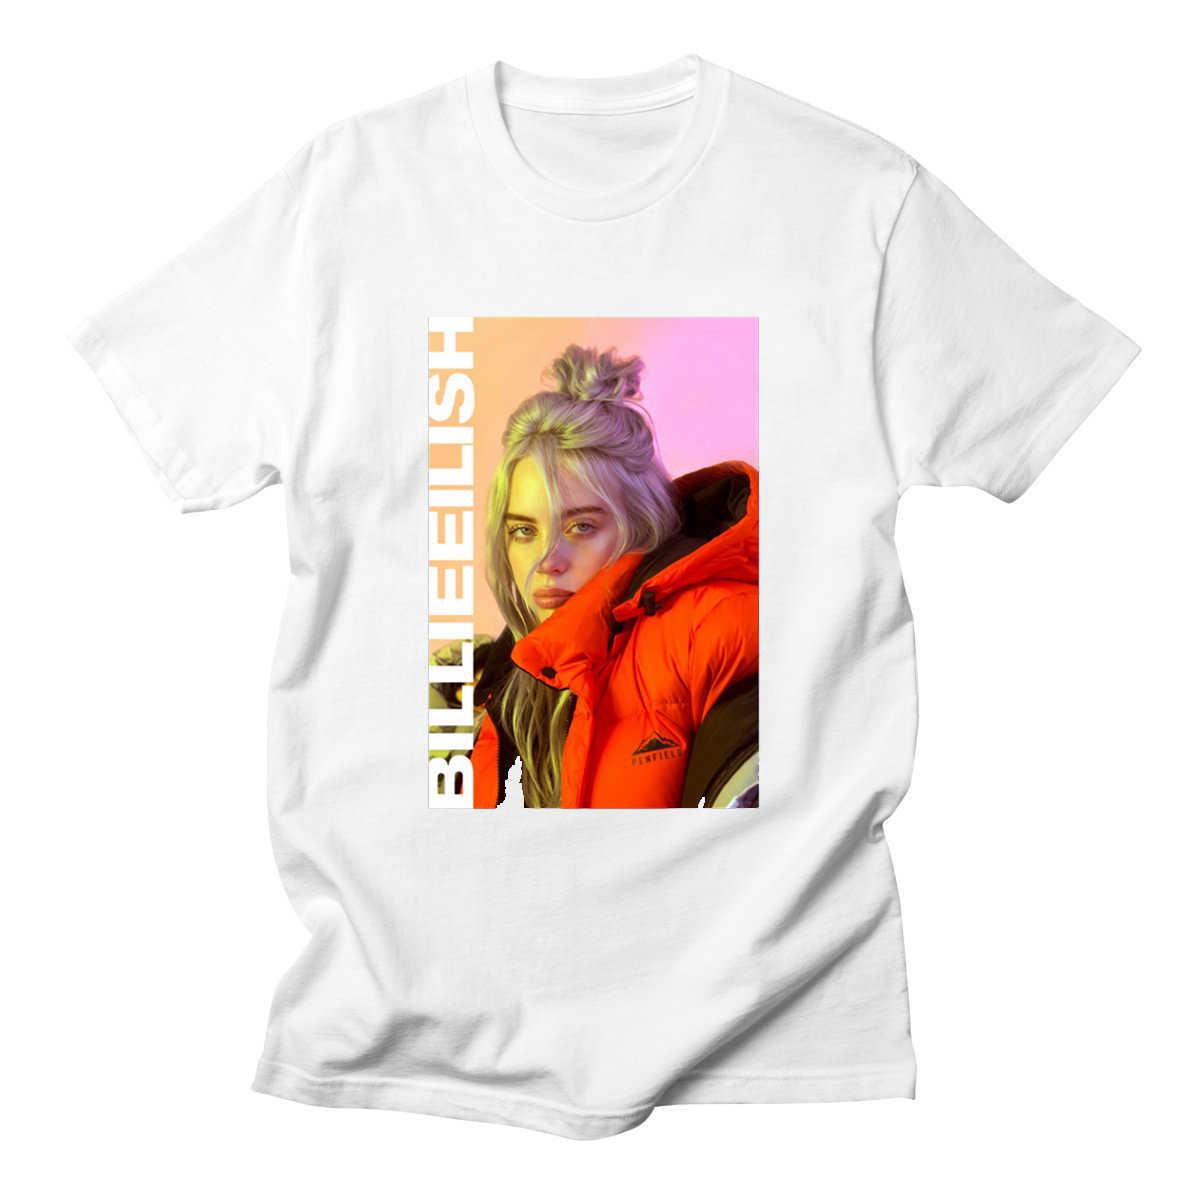 Eilish Corta Con Cuello La De Camiseta Vendimia Billie Música Redondo Algodón Manga oQsrdBxCth